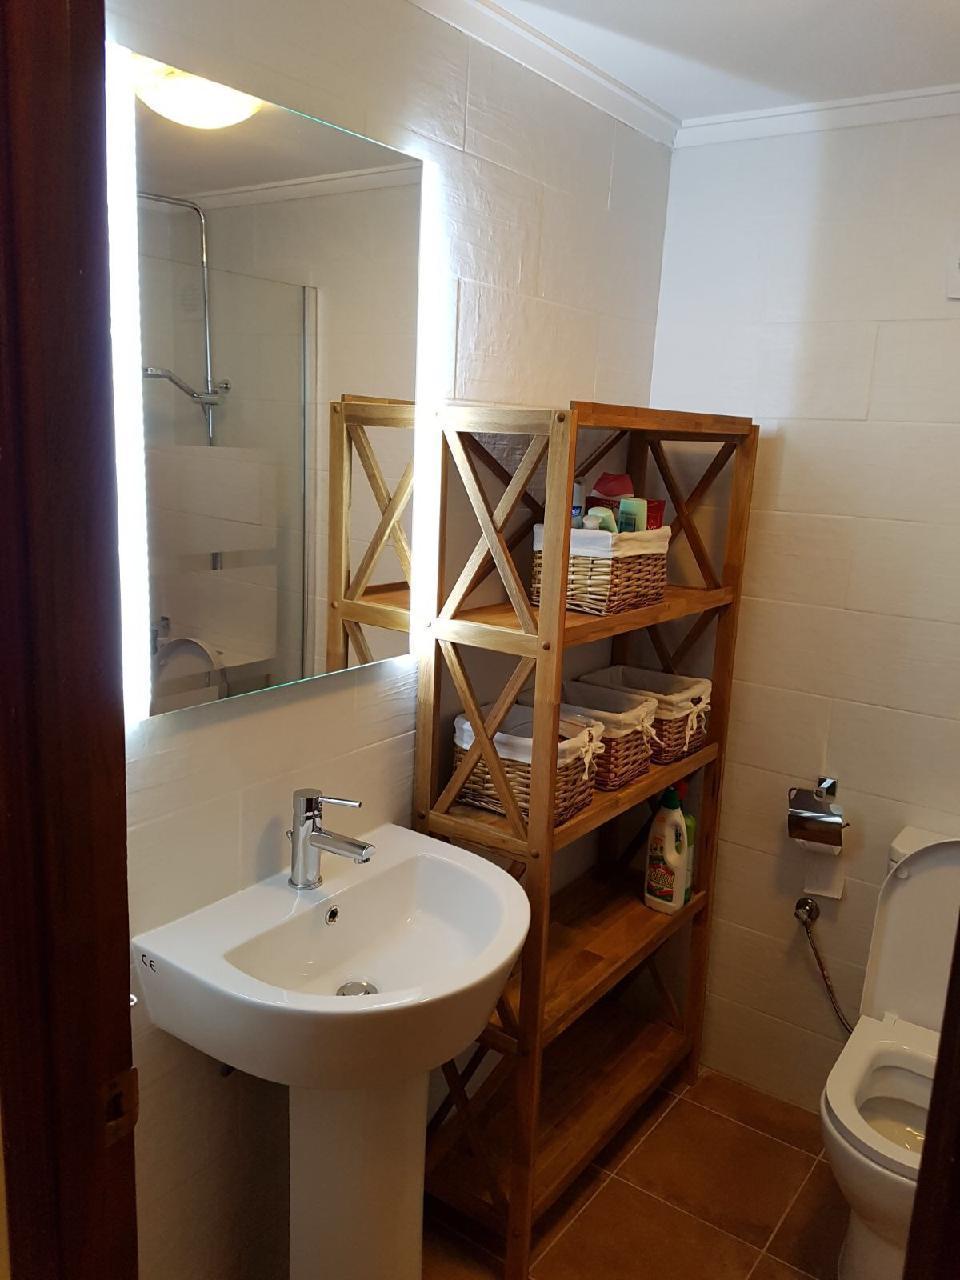 Appartement de vacances Sonnige 3.5 Zi-Wohnung am Meer (1026876), Torrevieja, Costa Blanca, Valence, Espagne, image 16